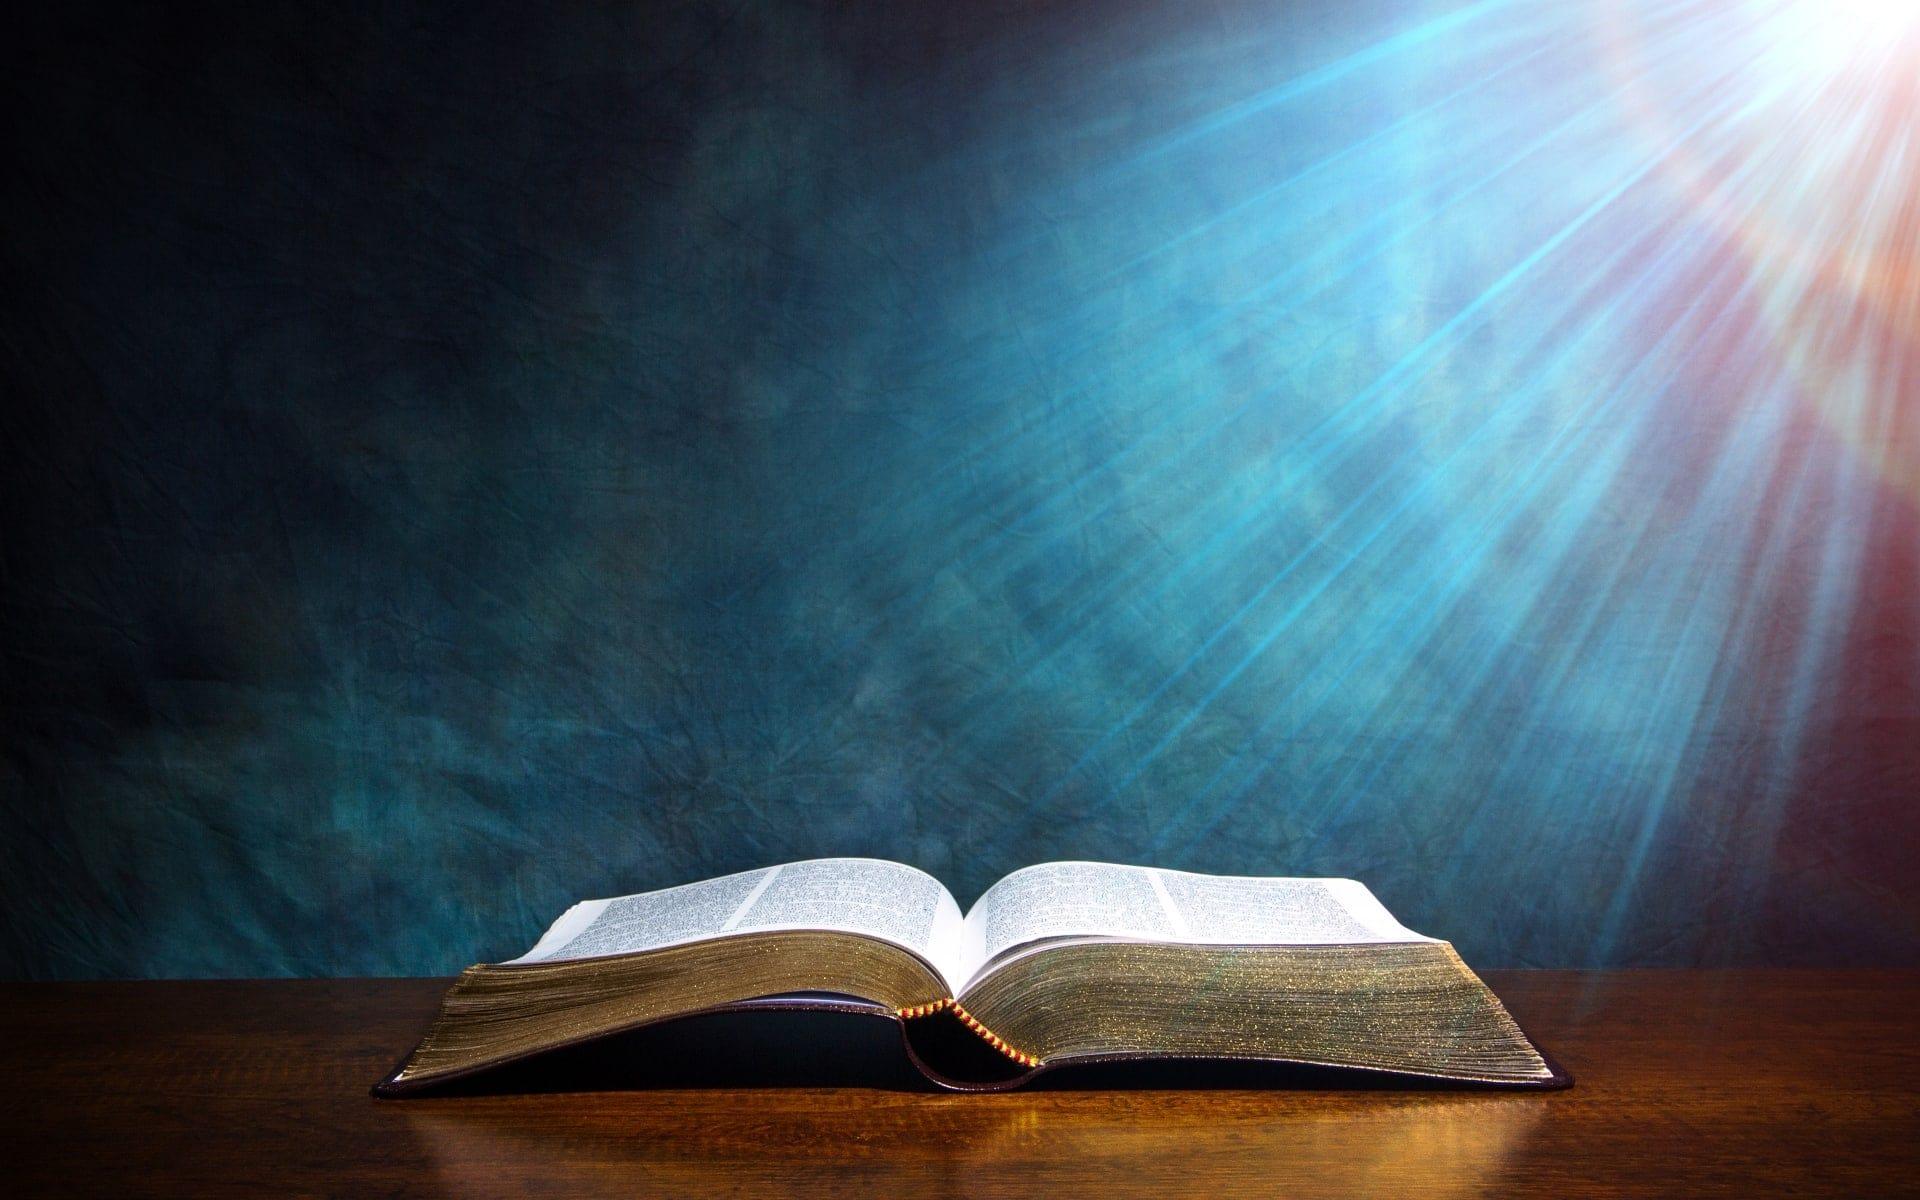 BibleConflations.com